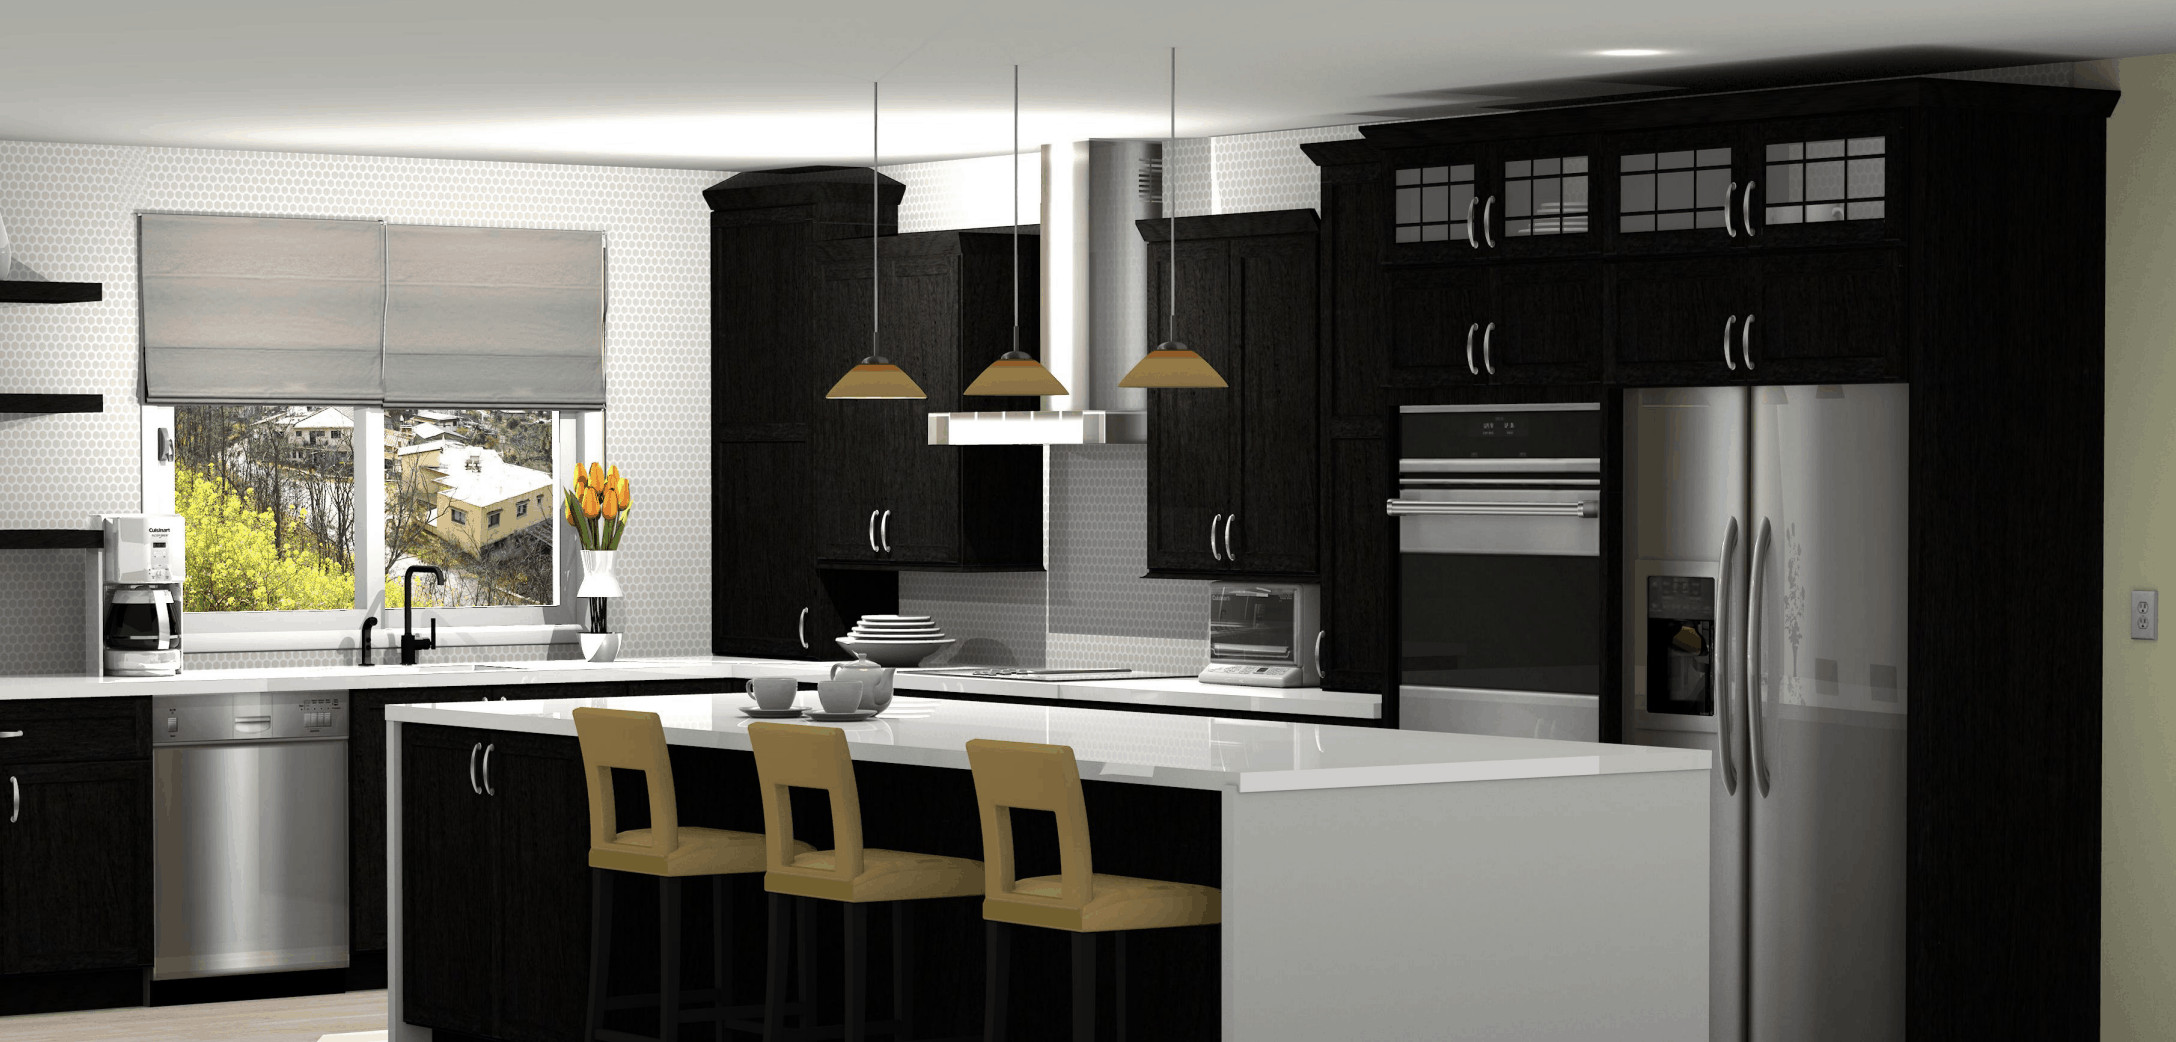 Kitchen Cabinet Designing Software  17 Best line Kitchen Design Software Options in 2019